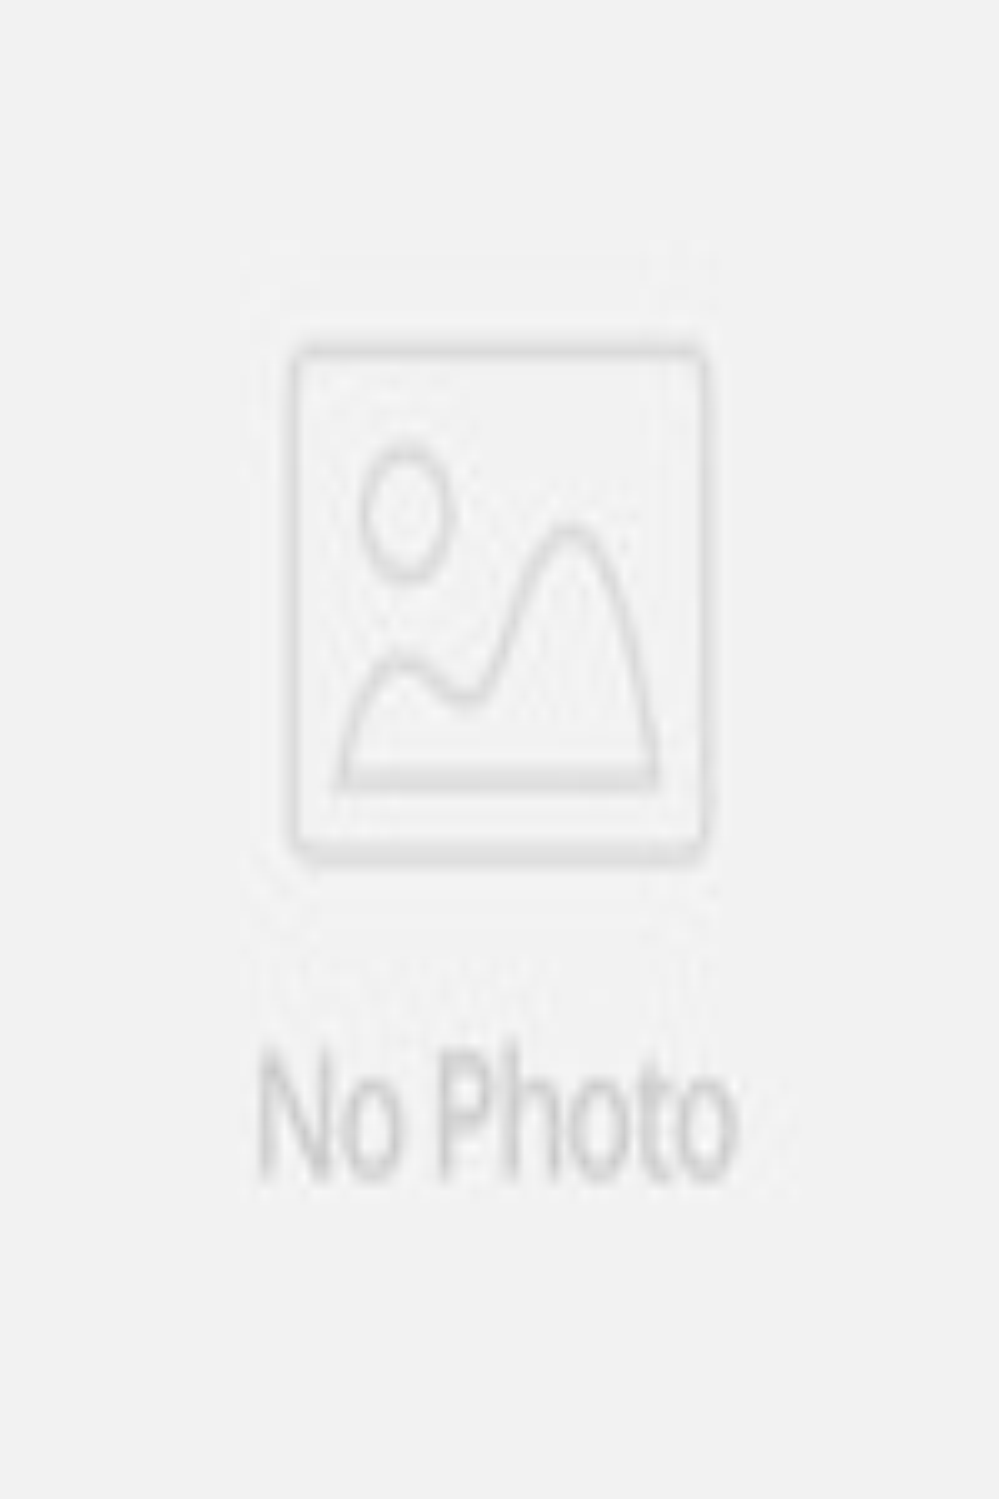 Tights leggings wholesale 1